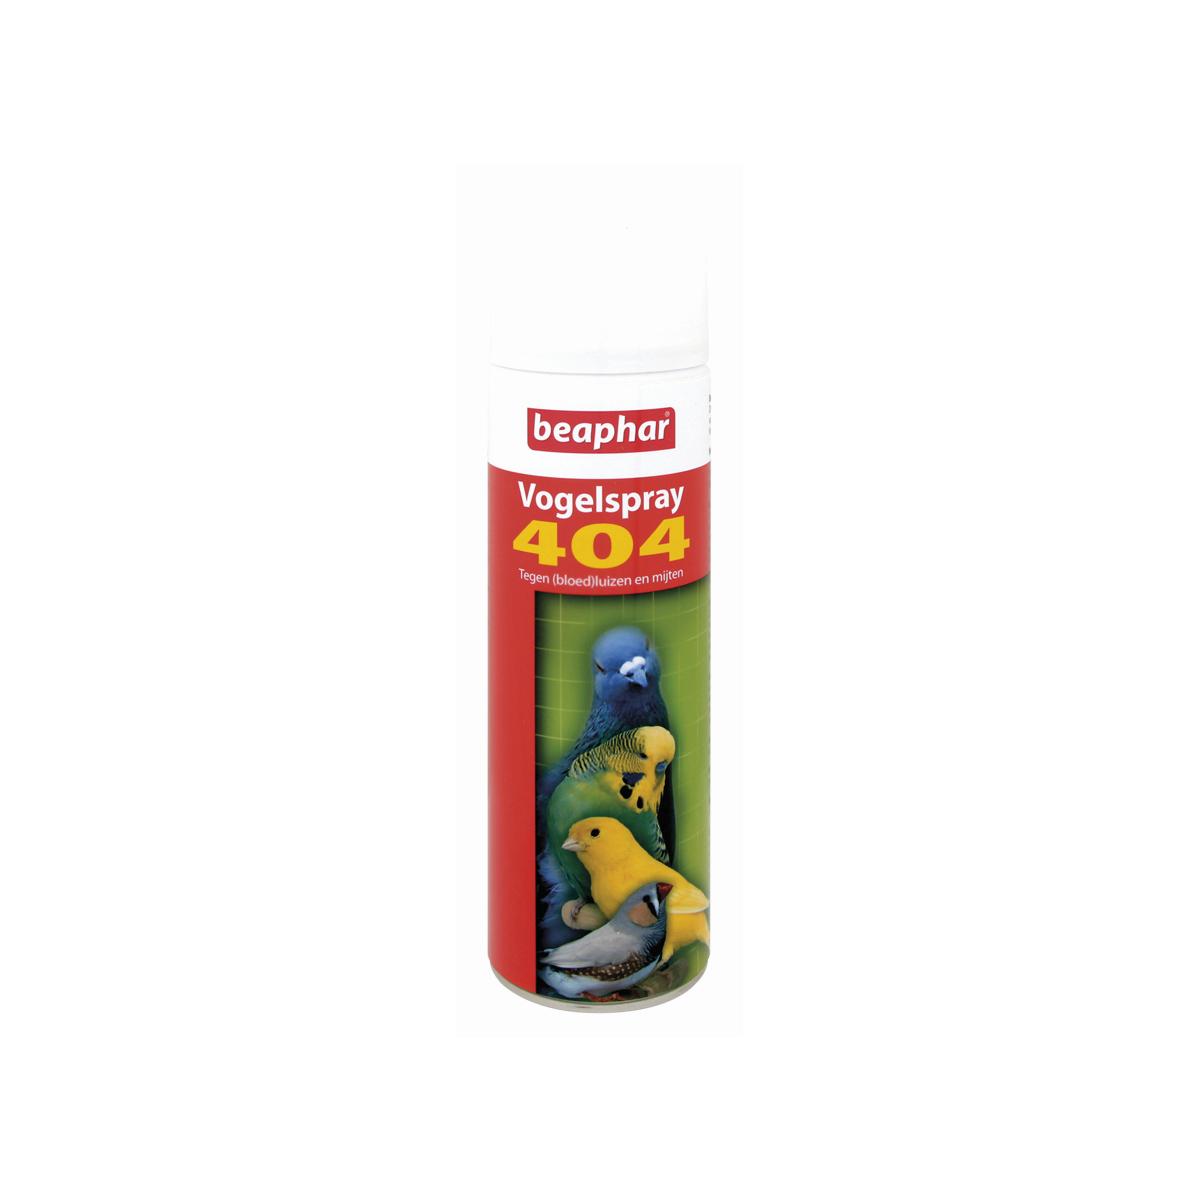 BEA 404 VOGELSPRAY 500ML 00001